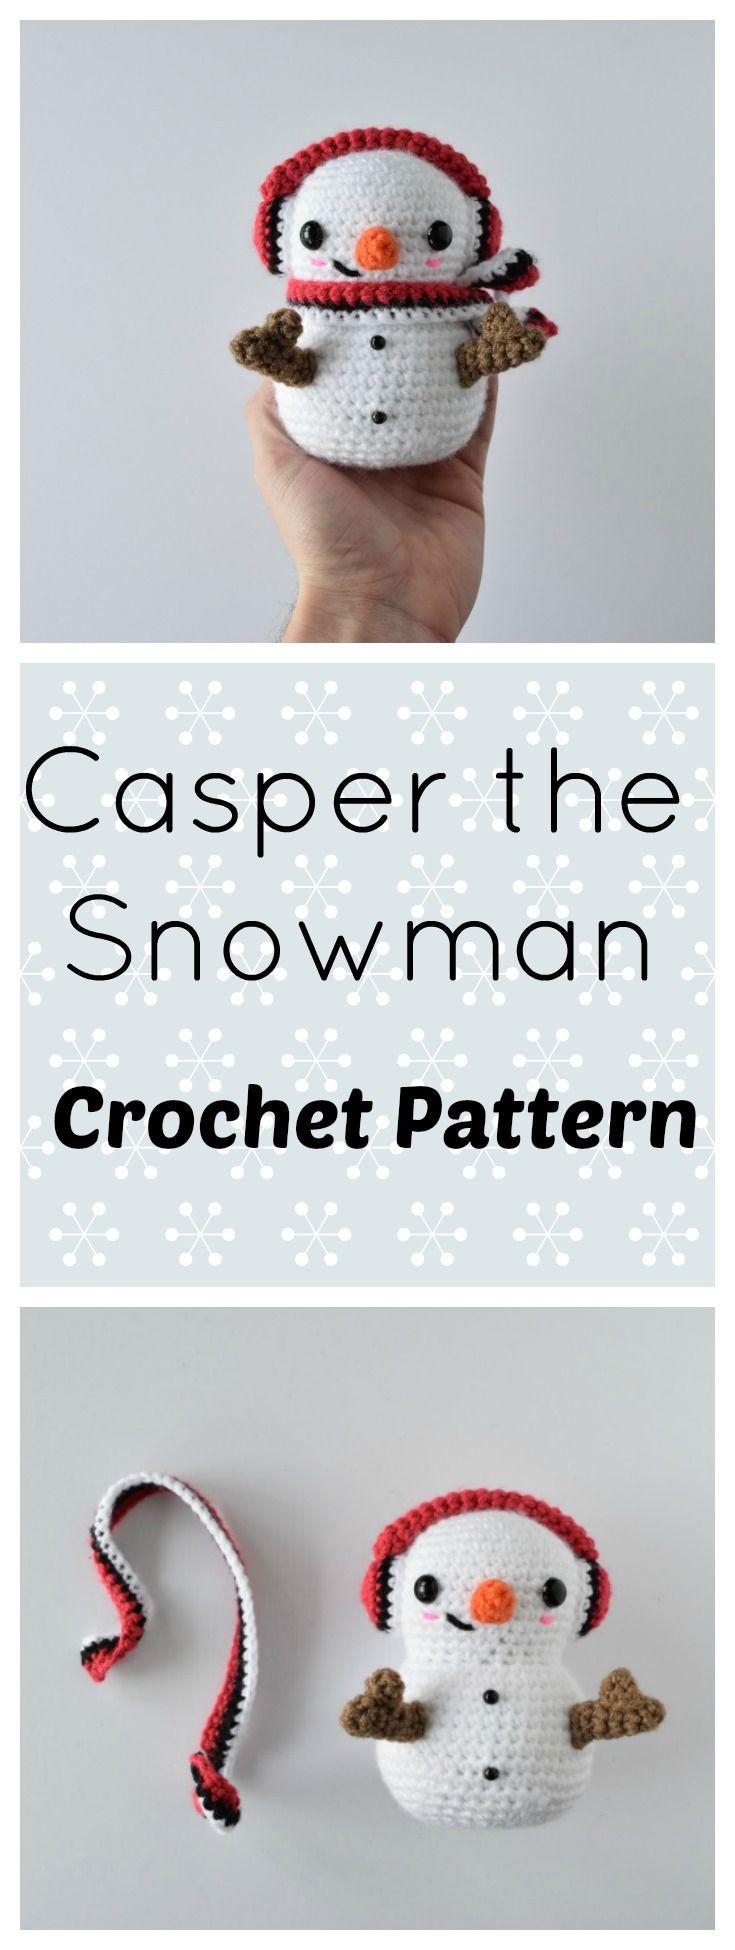 Crochet Snowman Free Amigurumi Pattern- Pokeball Themed | Cute ...